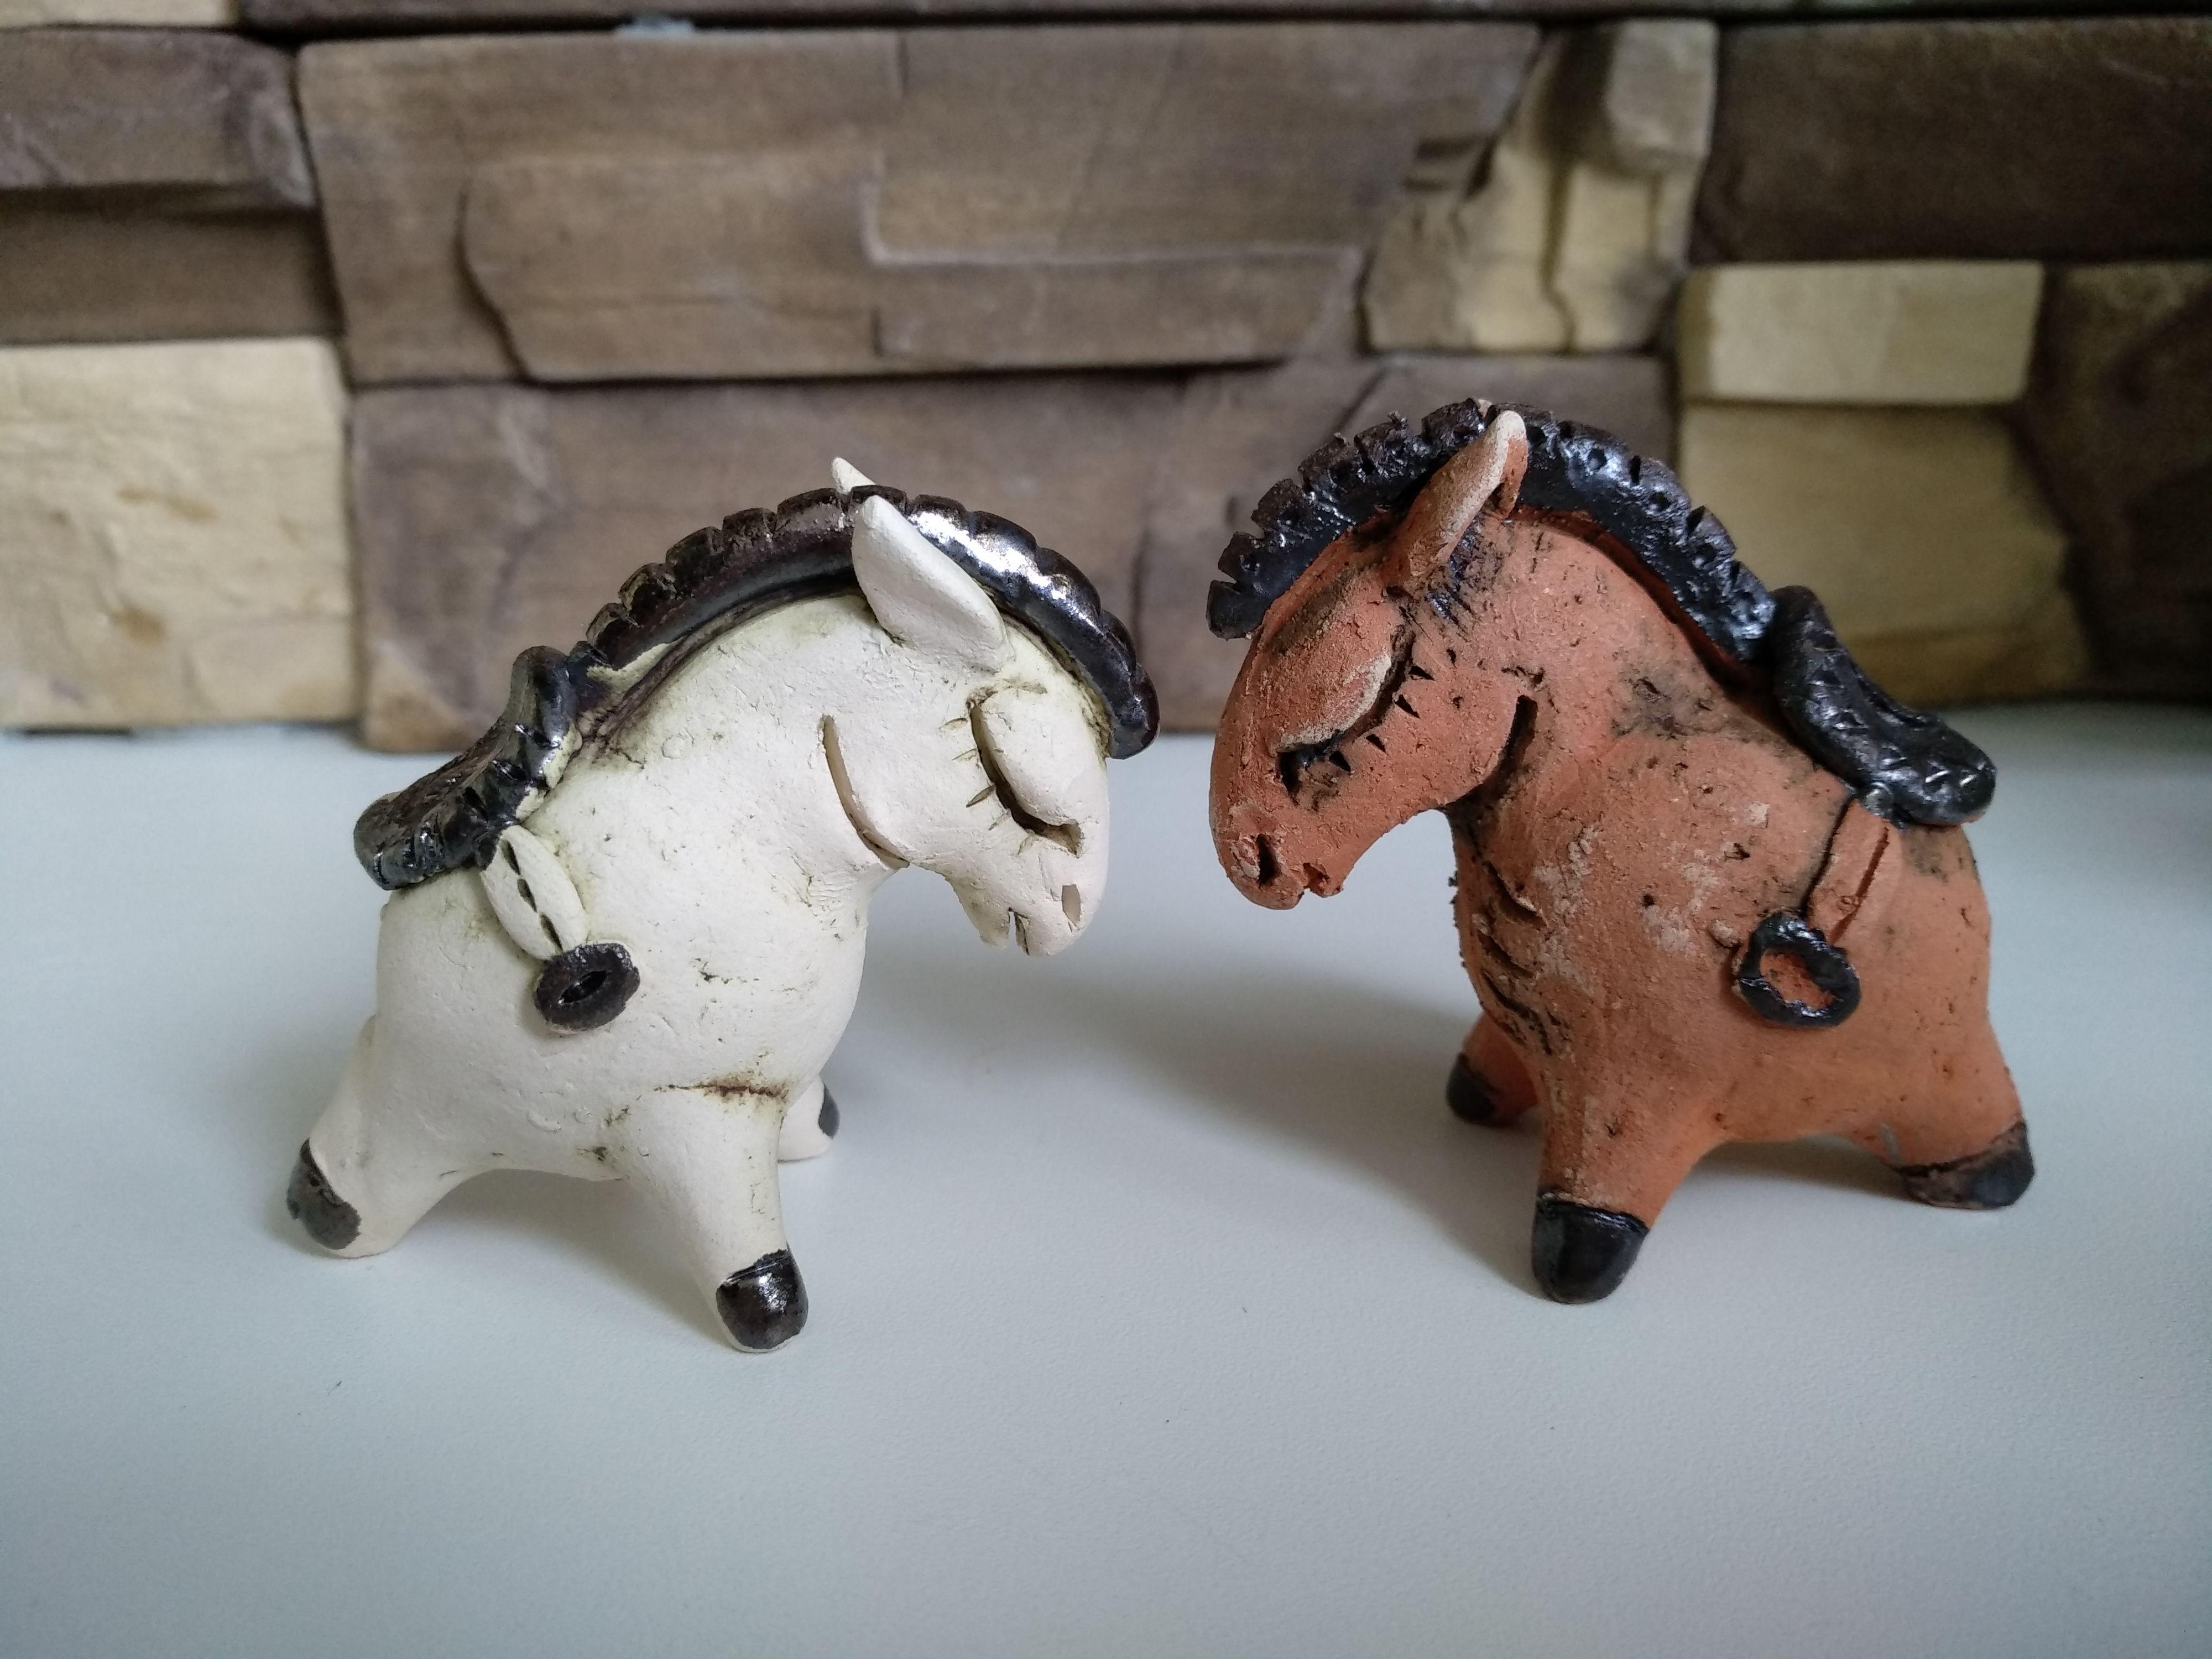 свистулька пони лошадка ослик сувенир подарок